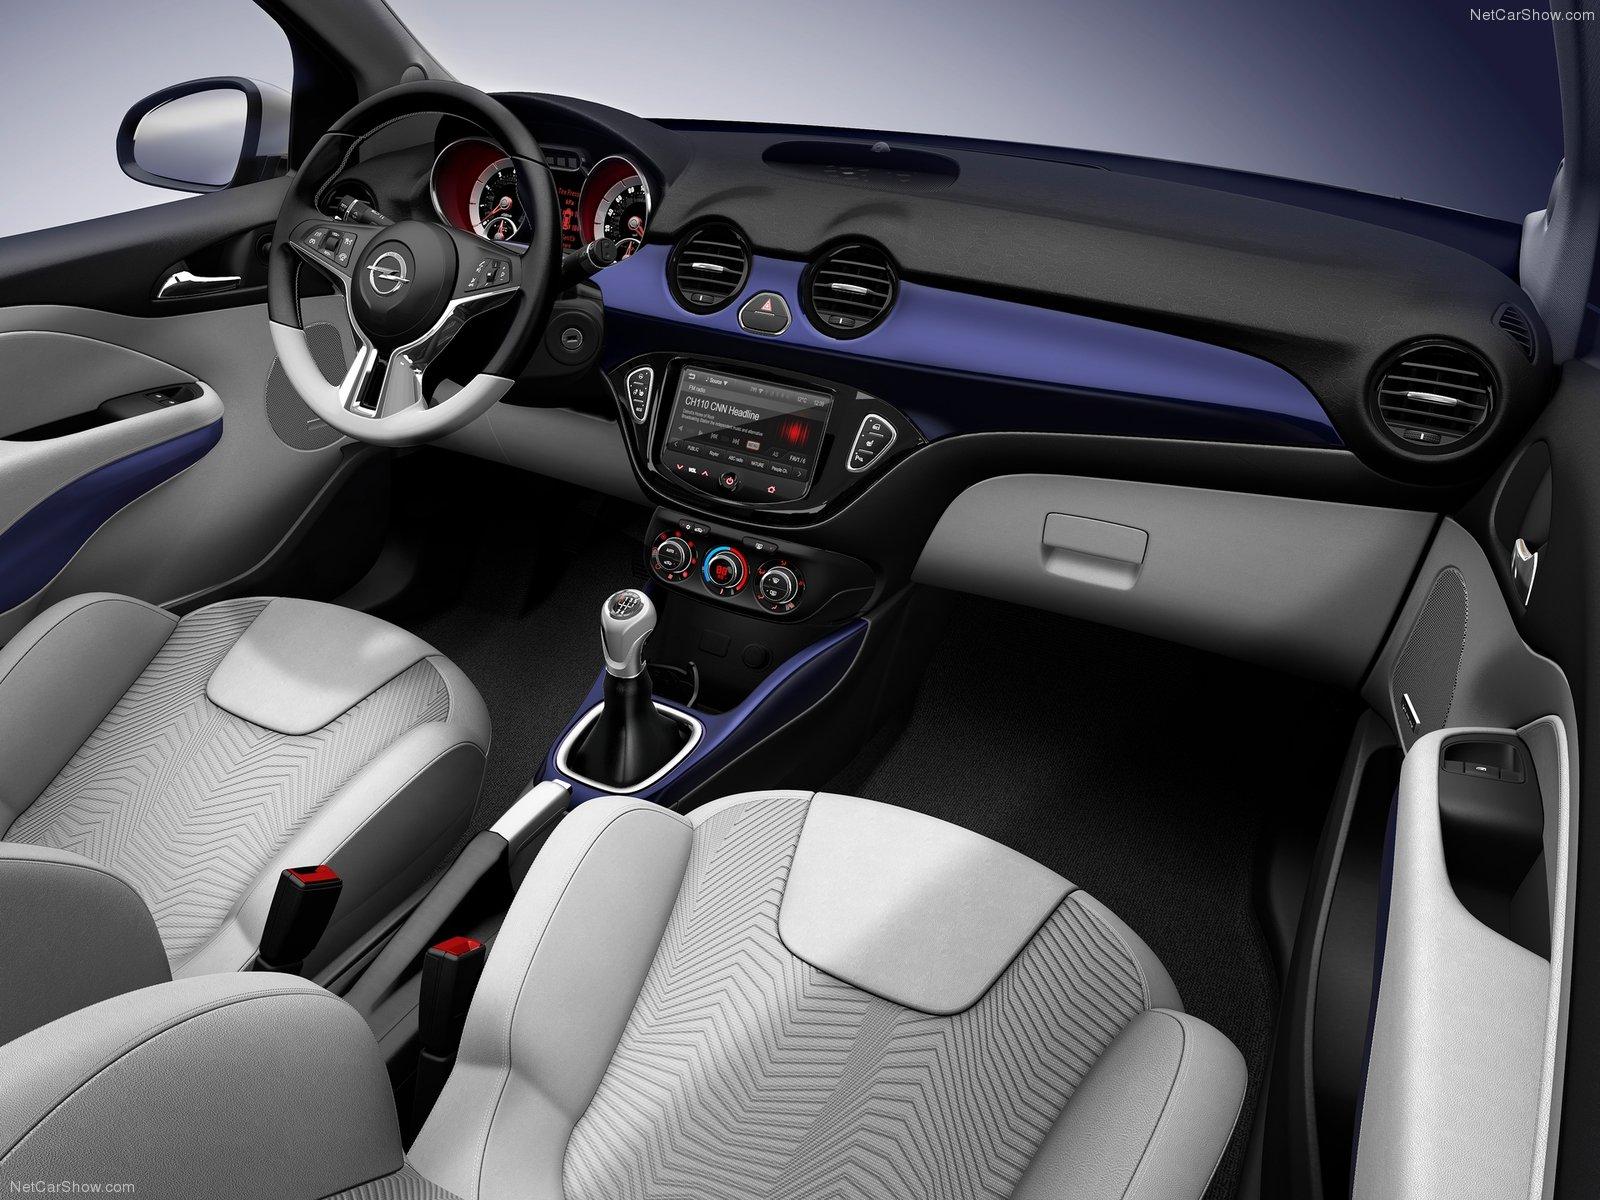 Opel-Adam-2013-1600-51.jpg